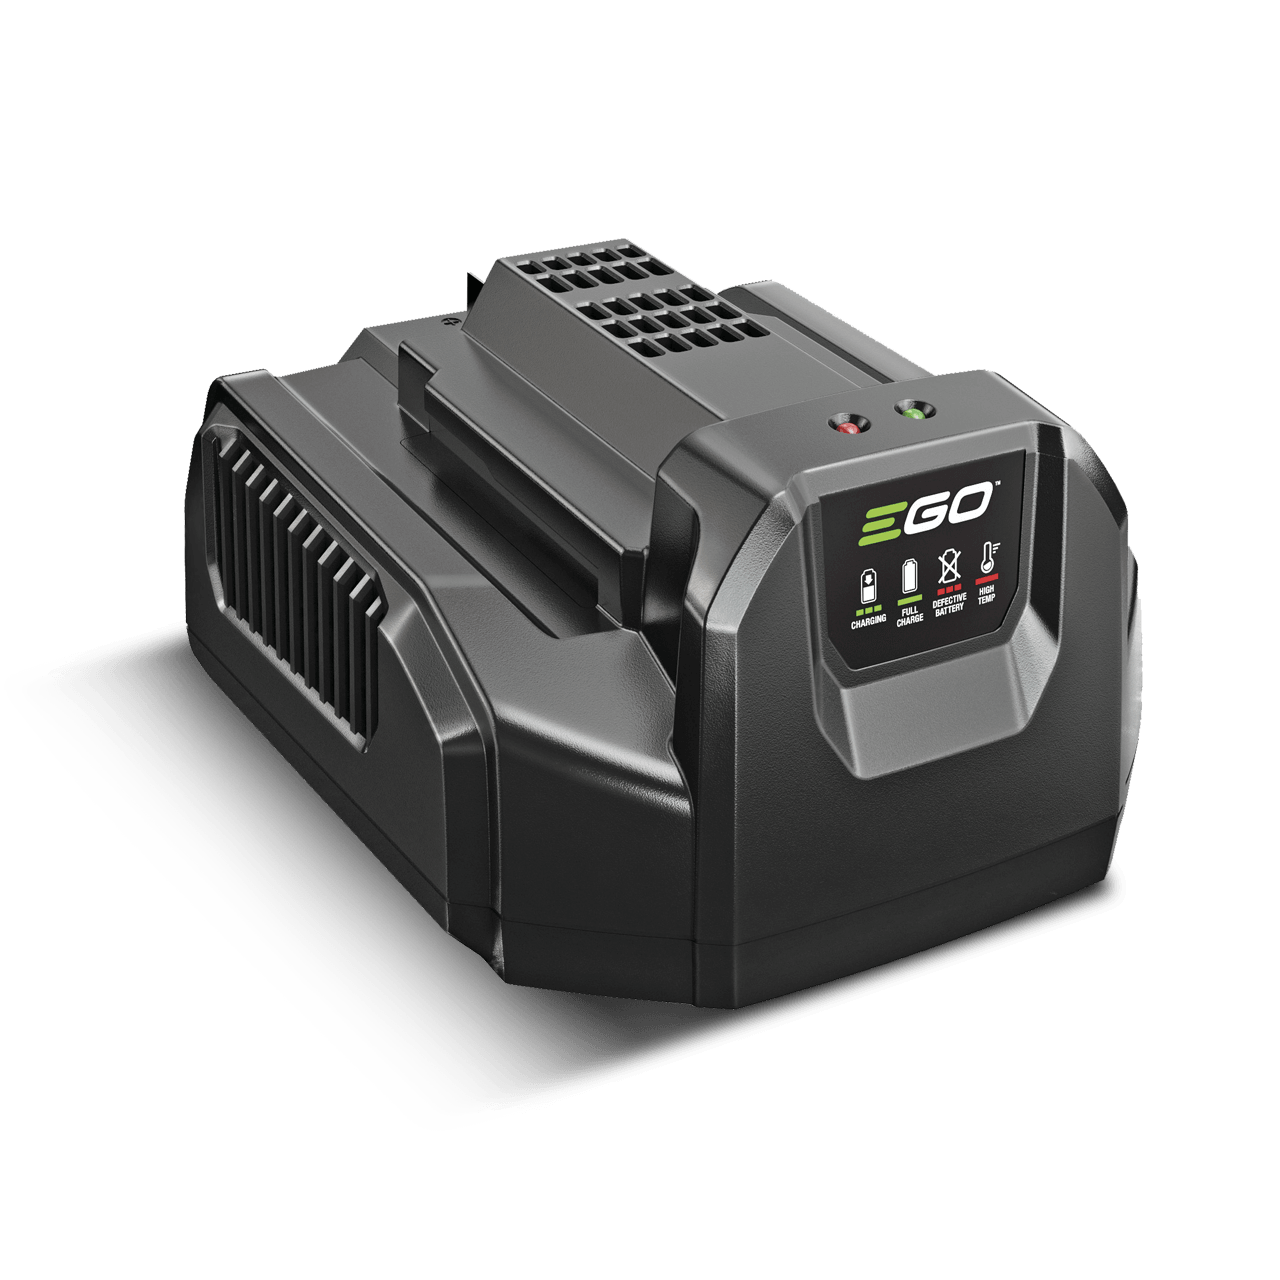 Caricabatterie EGO Standard CH 2100 E